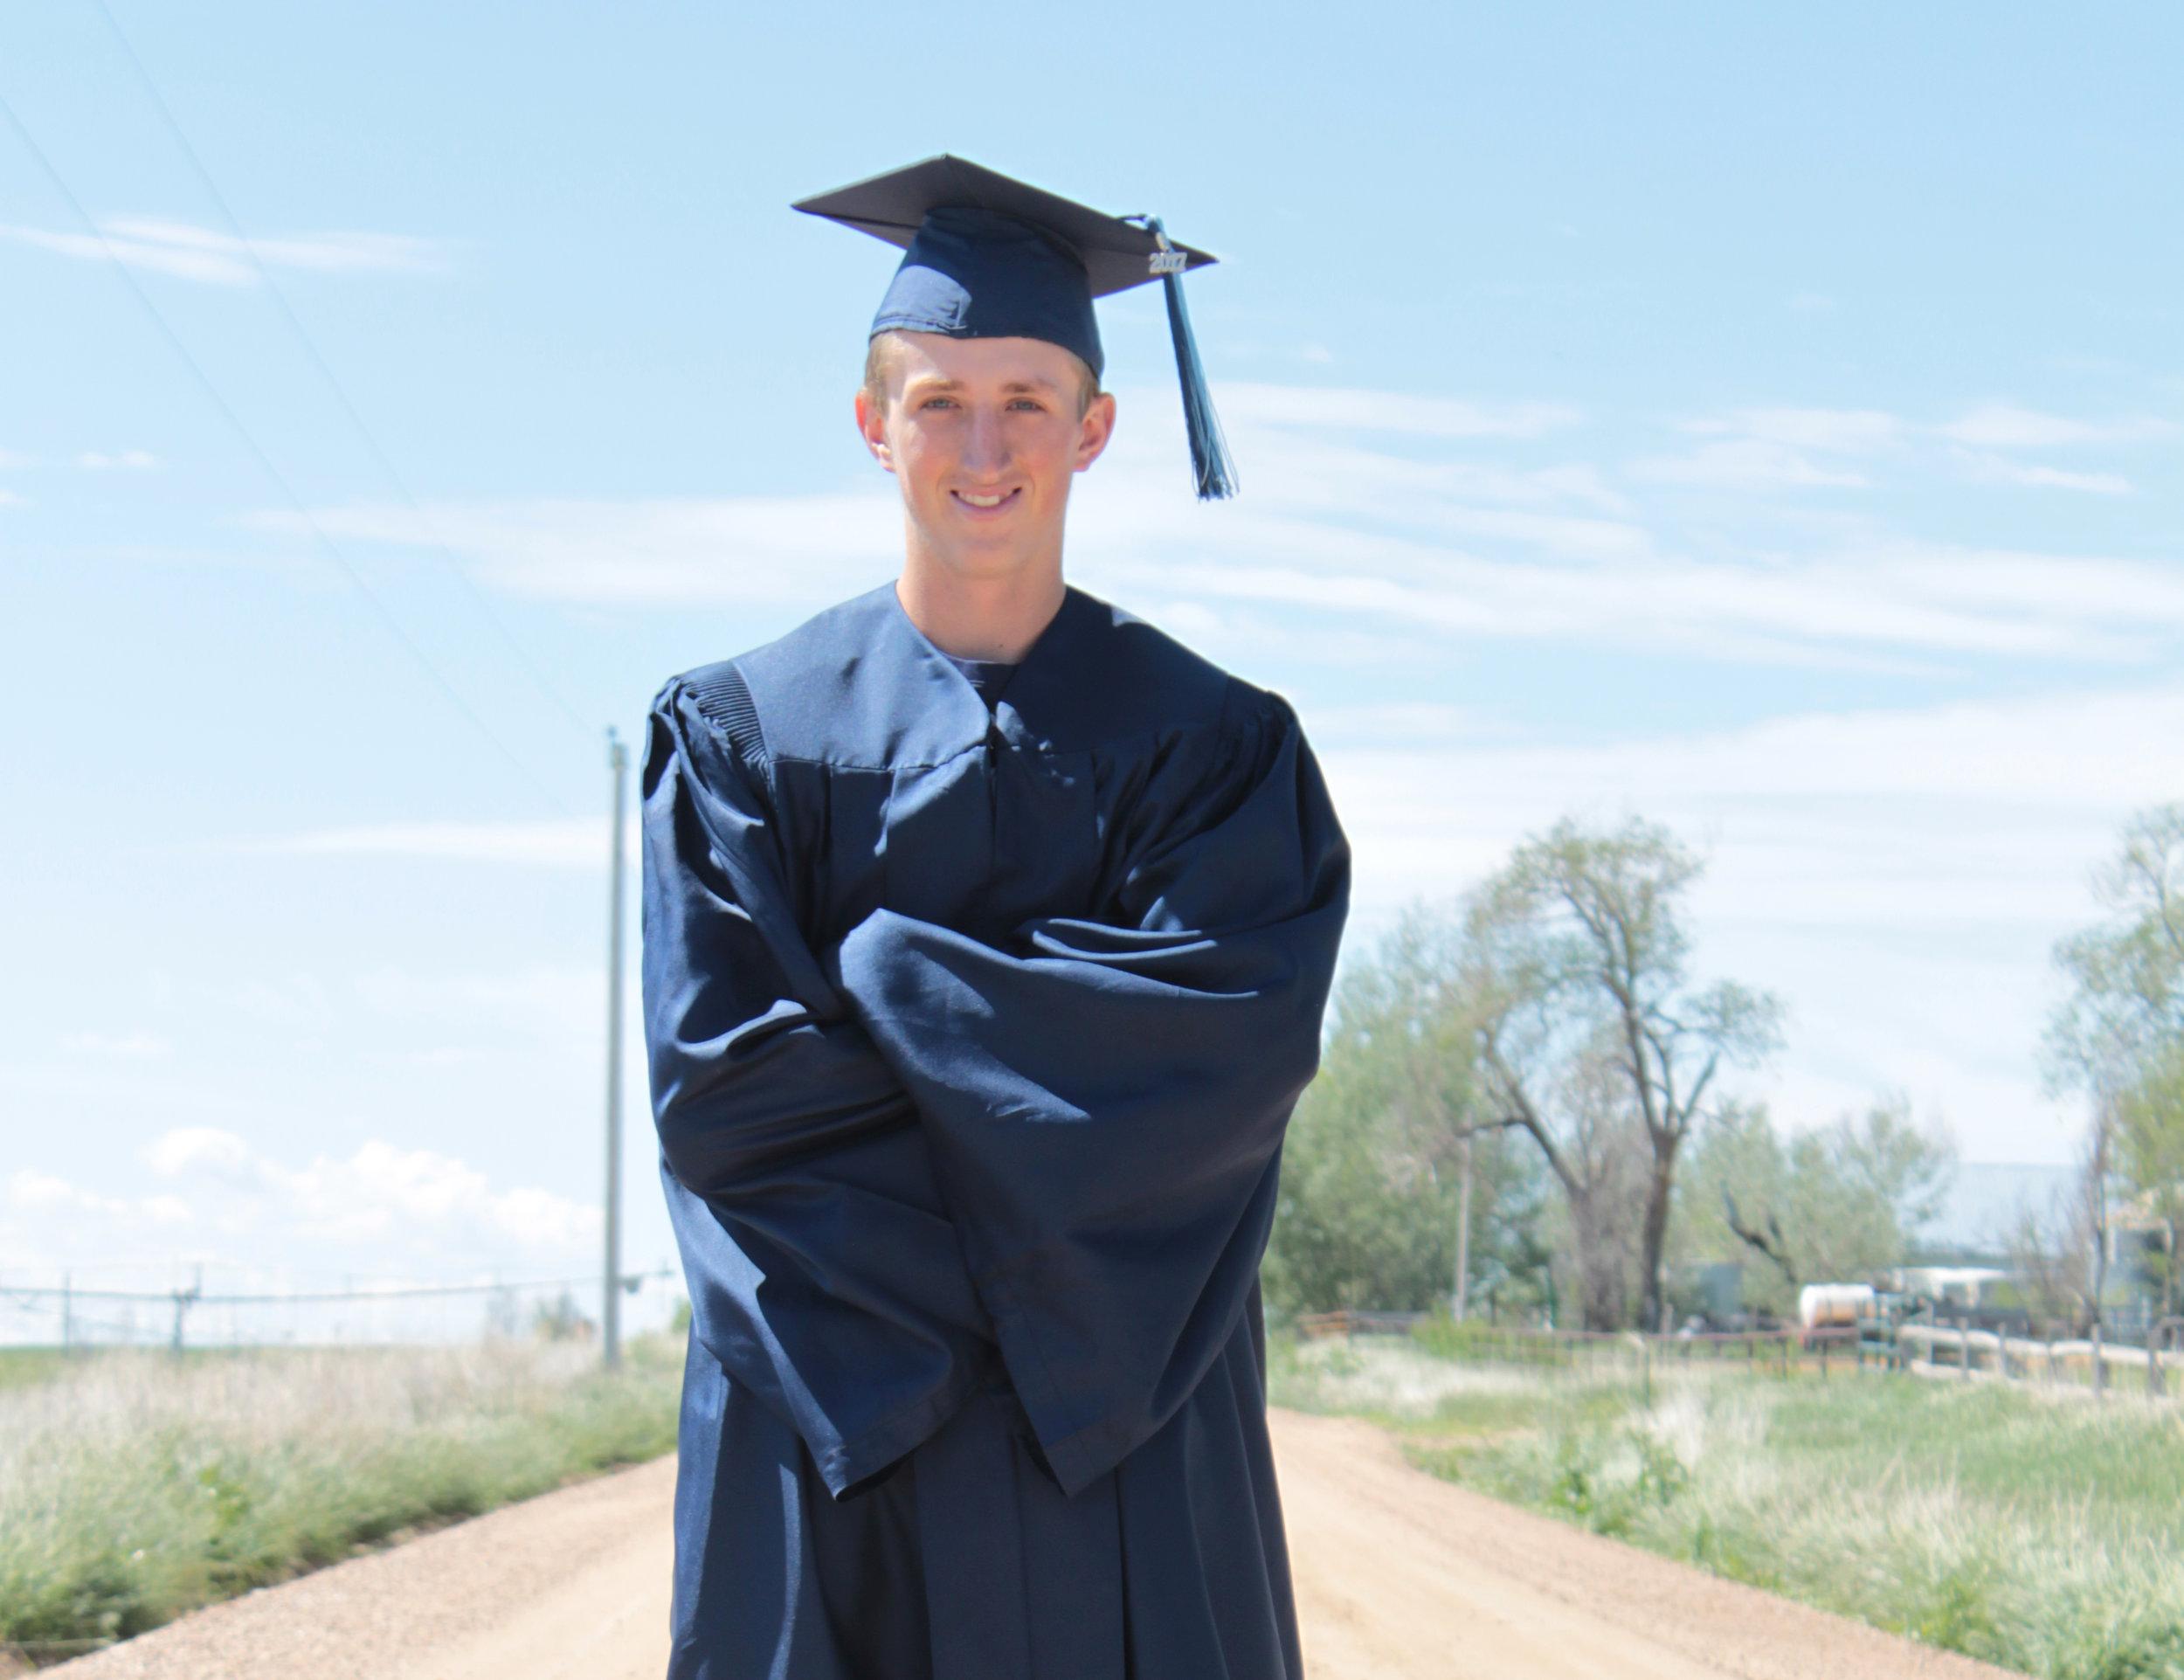 2017 Scholarship Recipient, Issah Smith